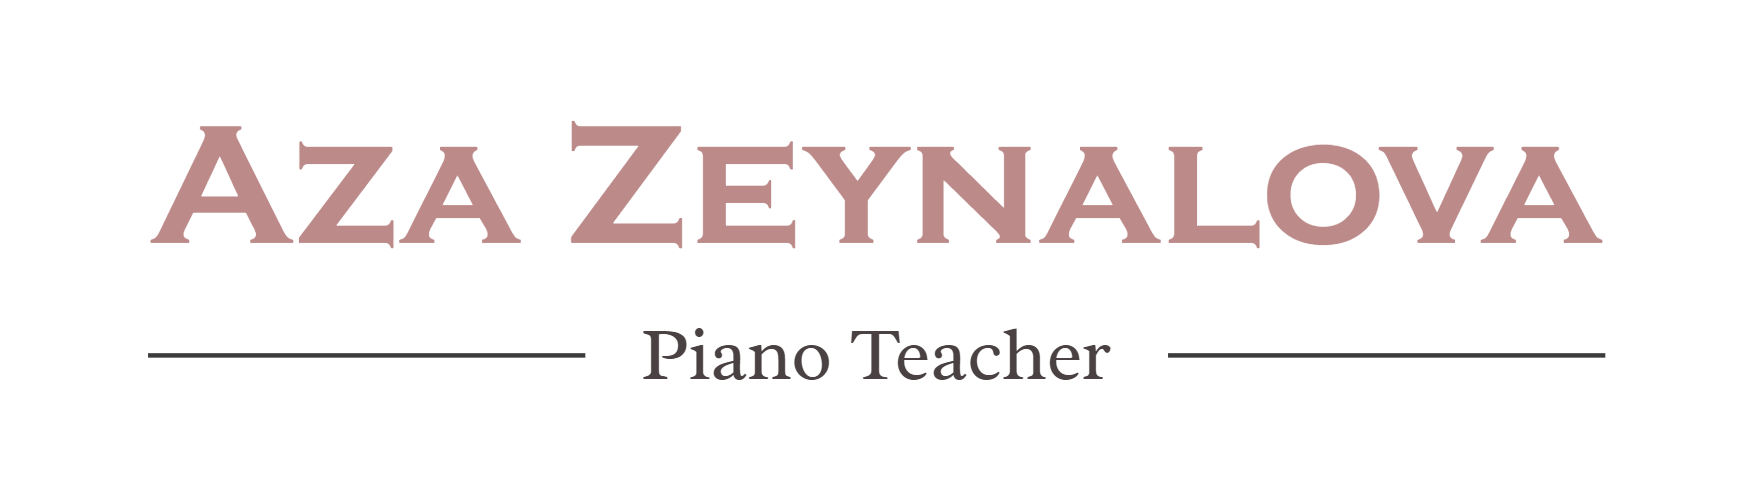 Aza Zeynalova - Piano Teacher